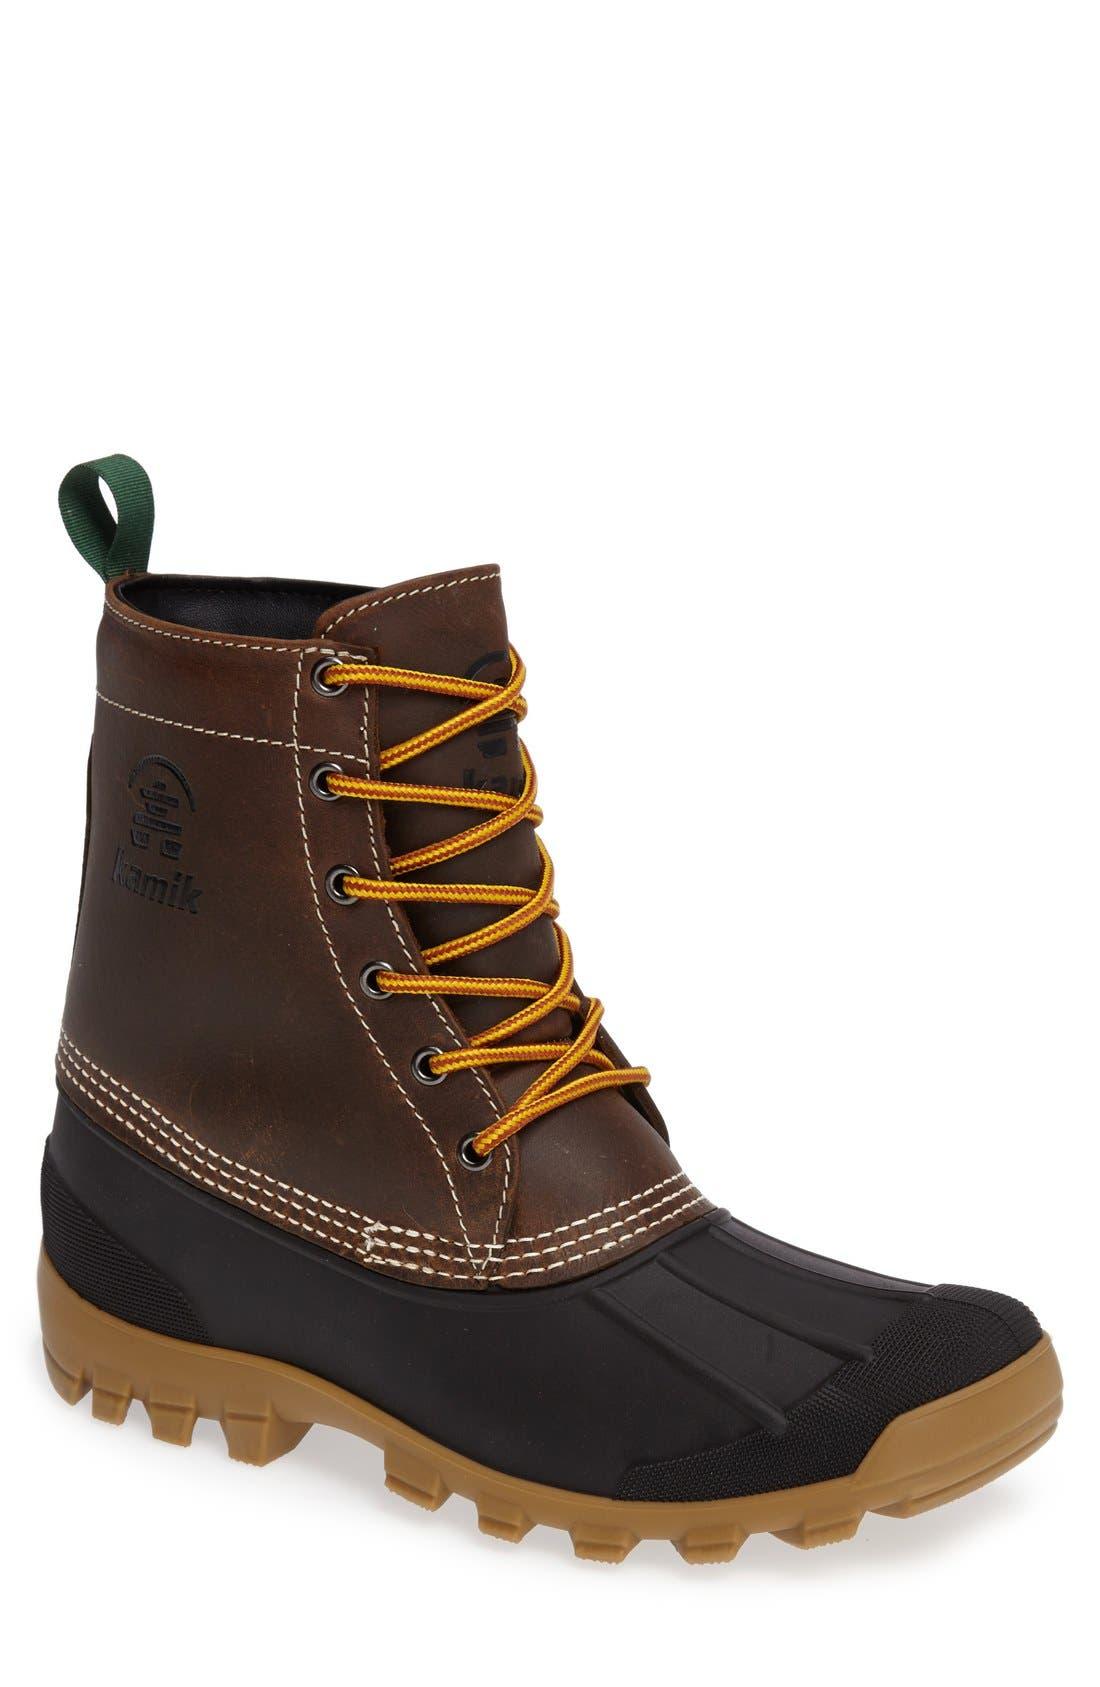 Yukon6 Waterproof Work Boot,                             Main thumbnail 1, color,                             Dark Brown Leather